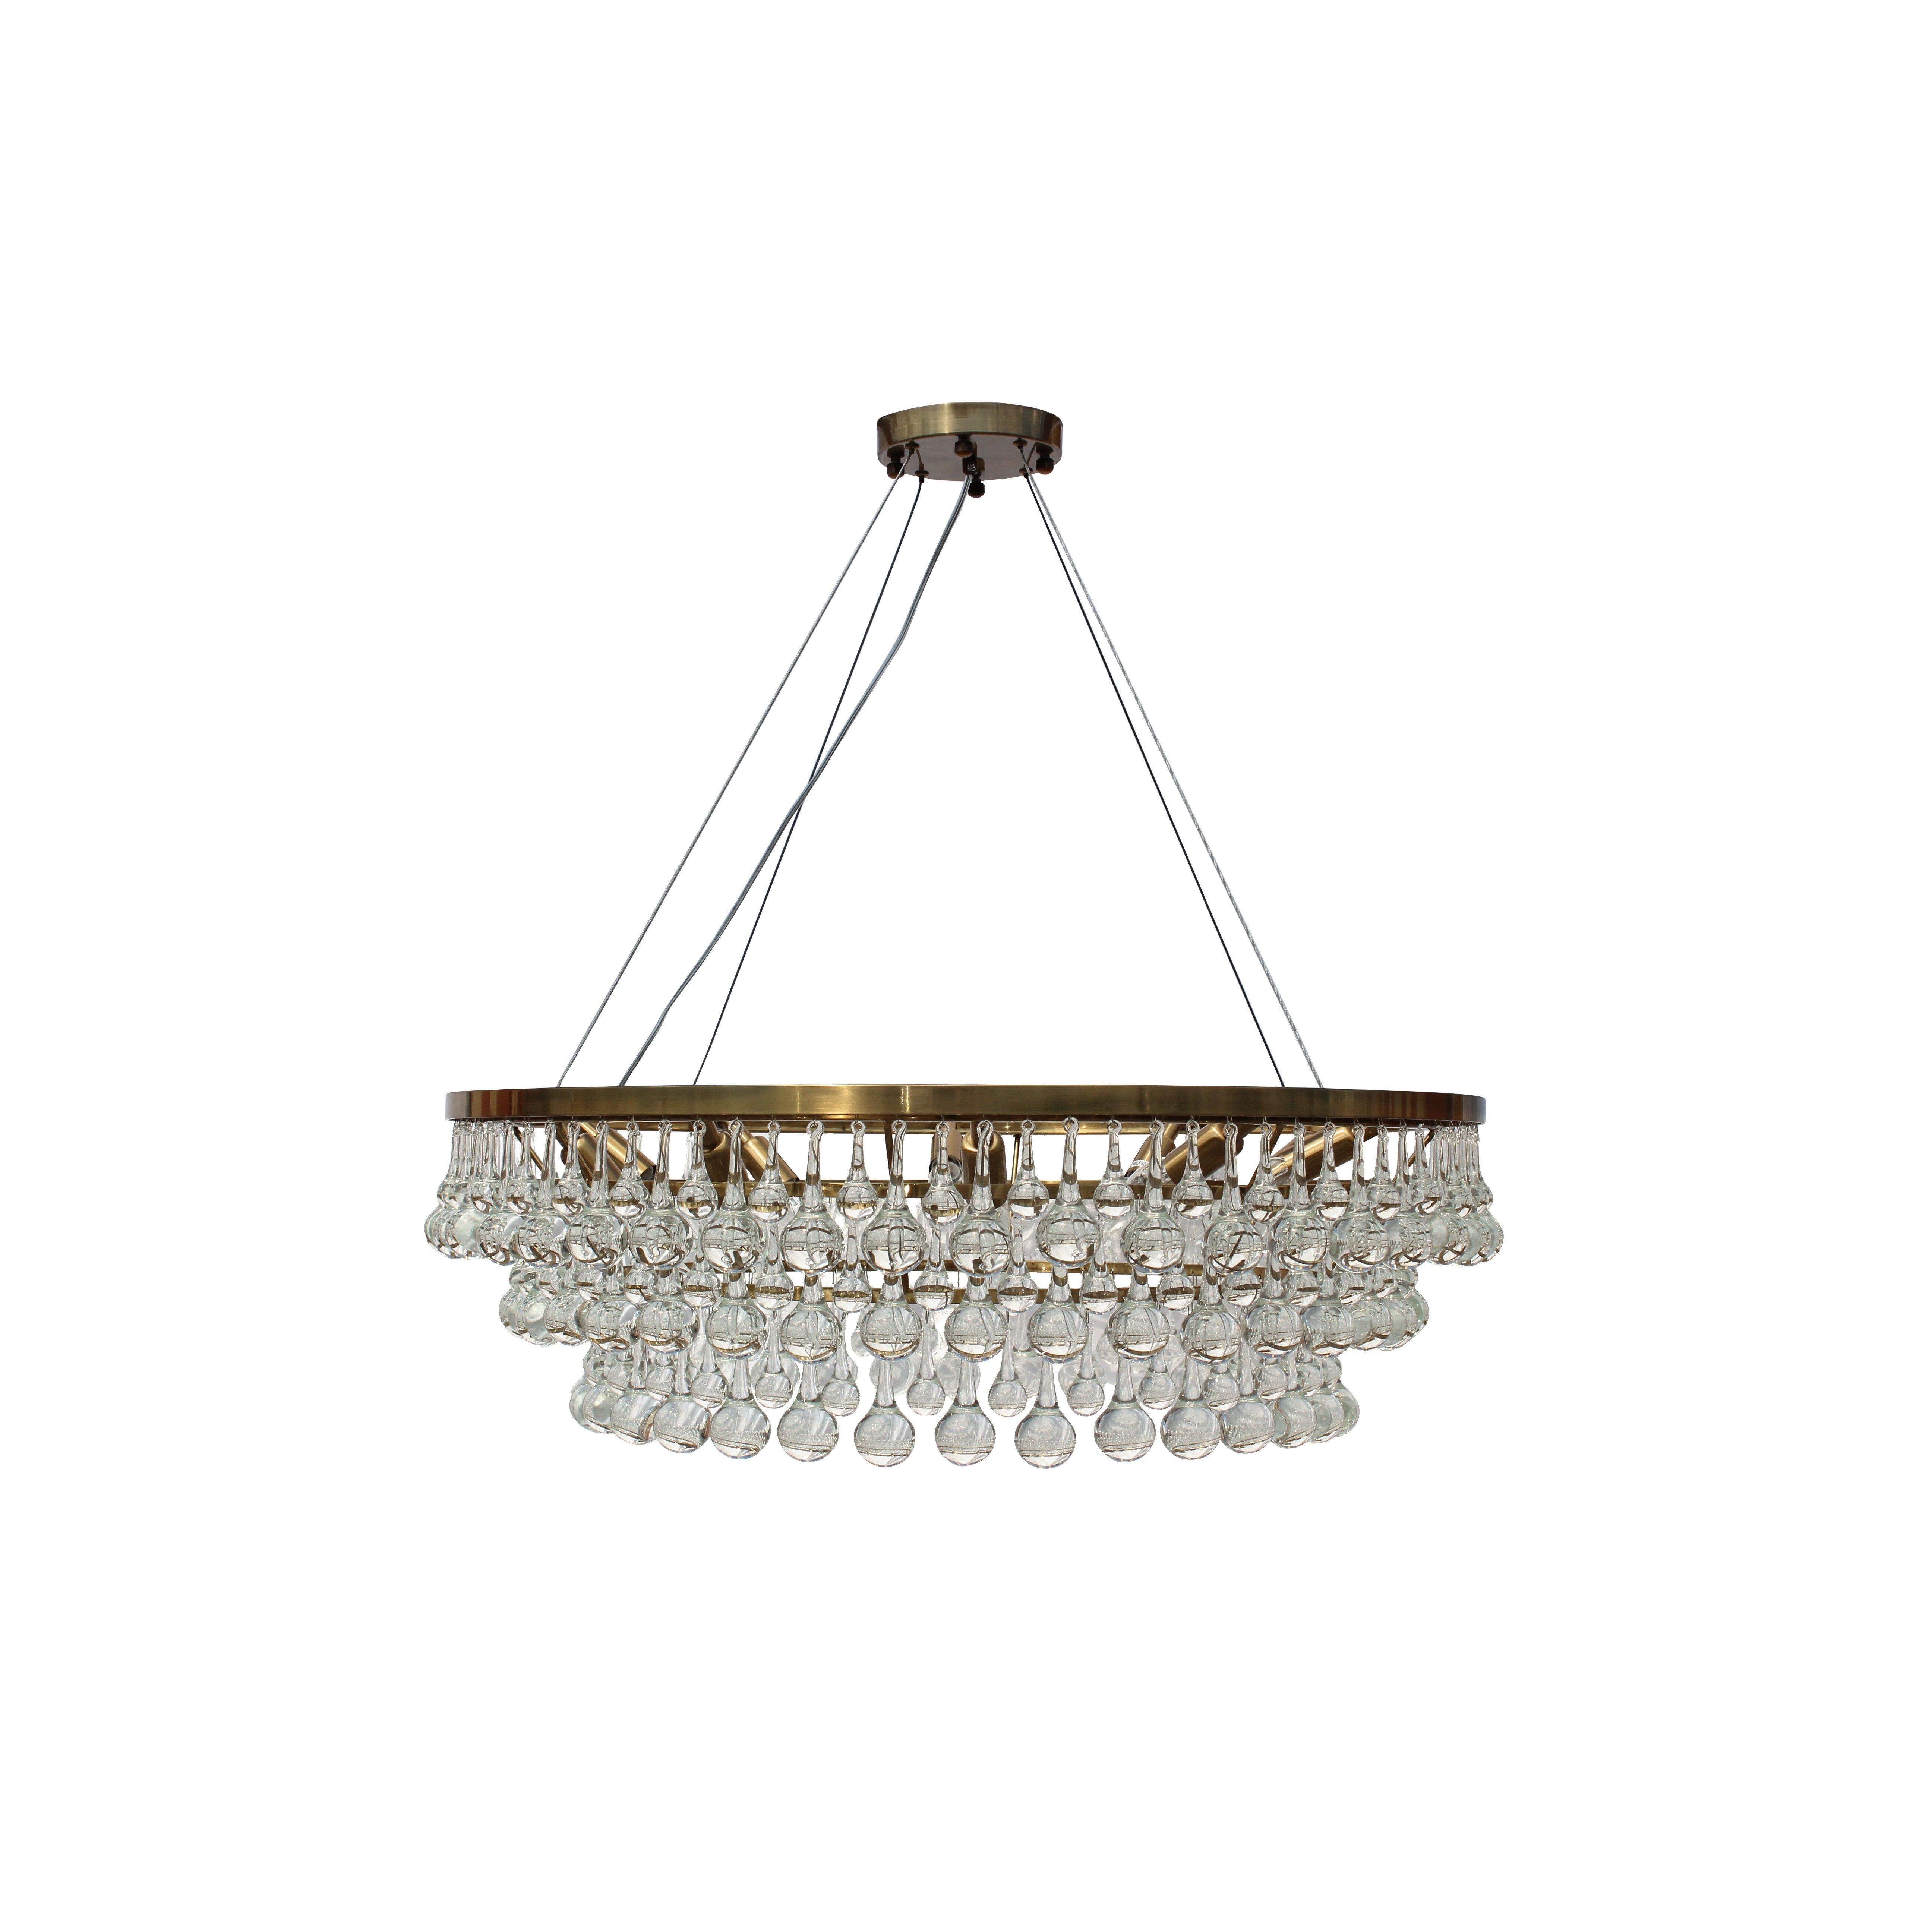 Pottery barn celeste chandelier - Lightupmyhome Celeste 10 Light Crystal Chandelier Reviews Wayfair